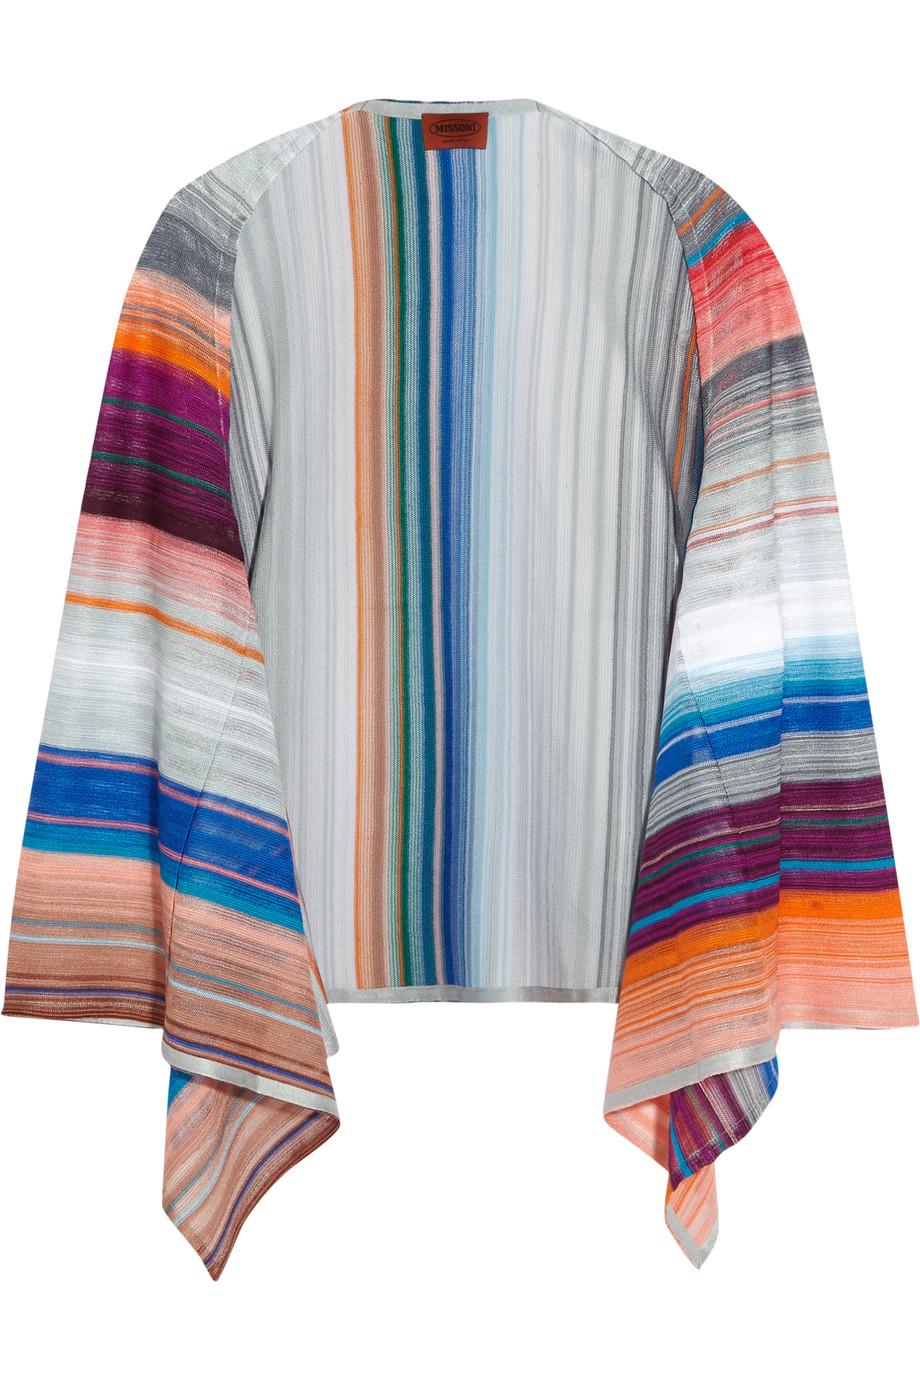 Missoni Crochet-Knit Cardigan, Pink/Gray, Women's